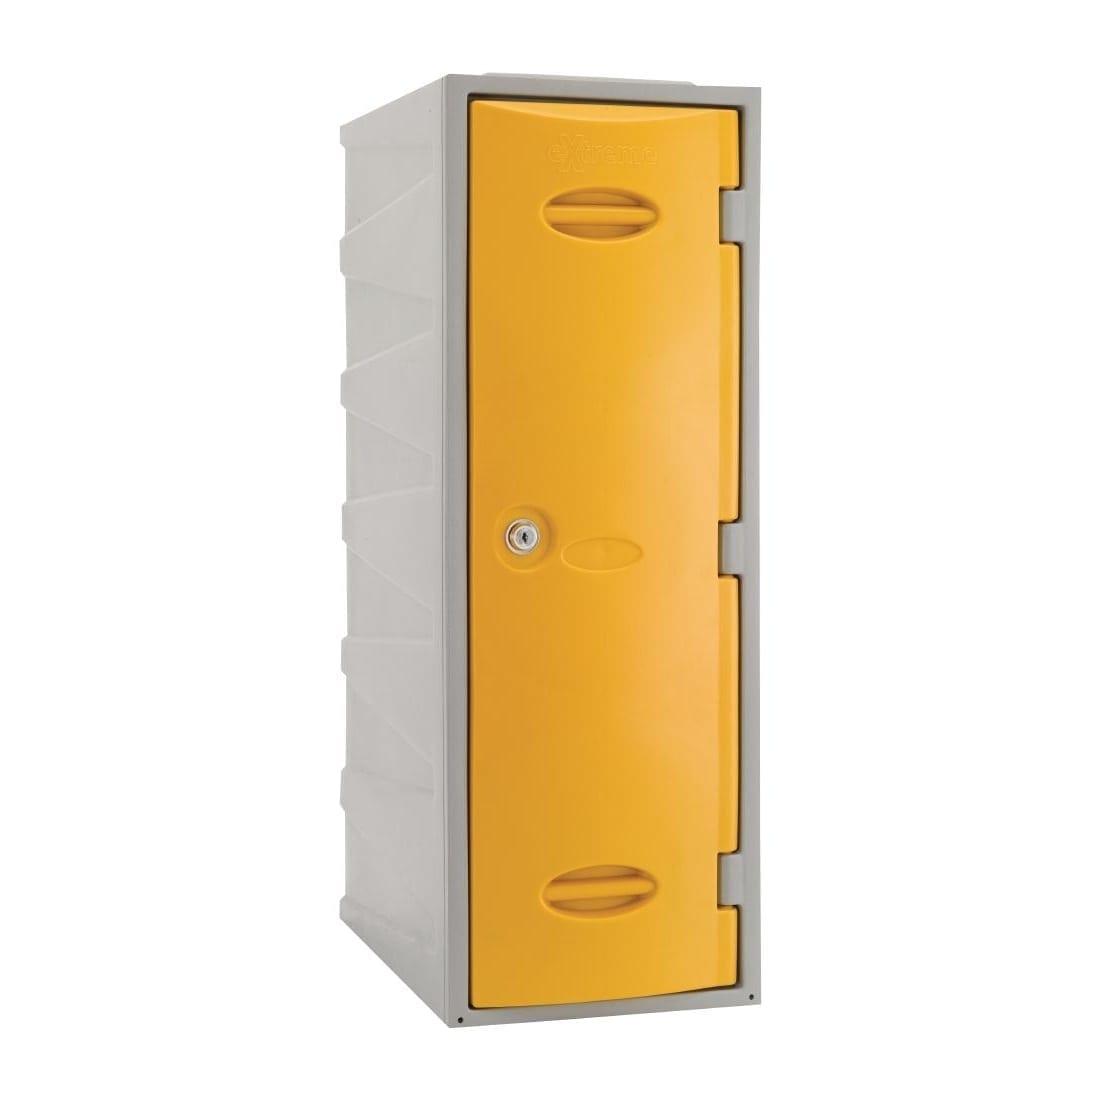 Extreme Modular Plastic Locker - 900mm high Yellow Camlock (Direct)-0